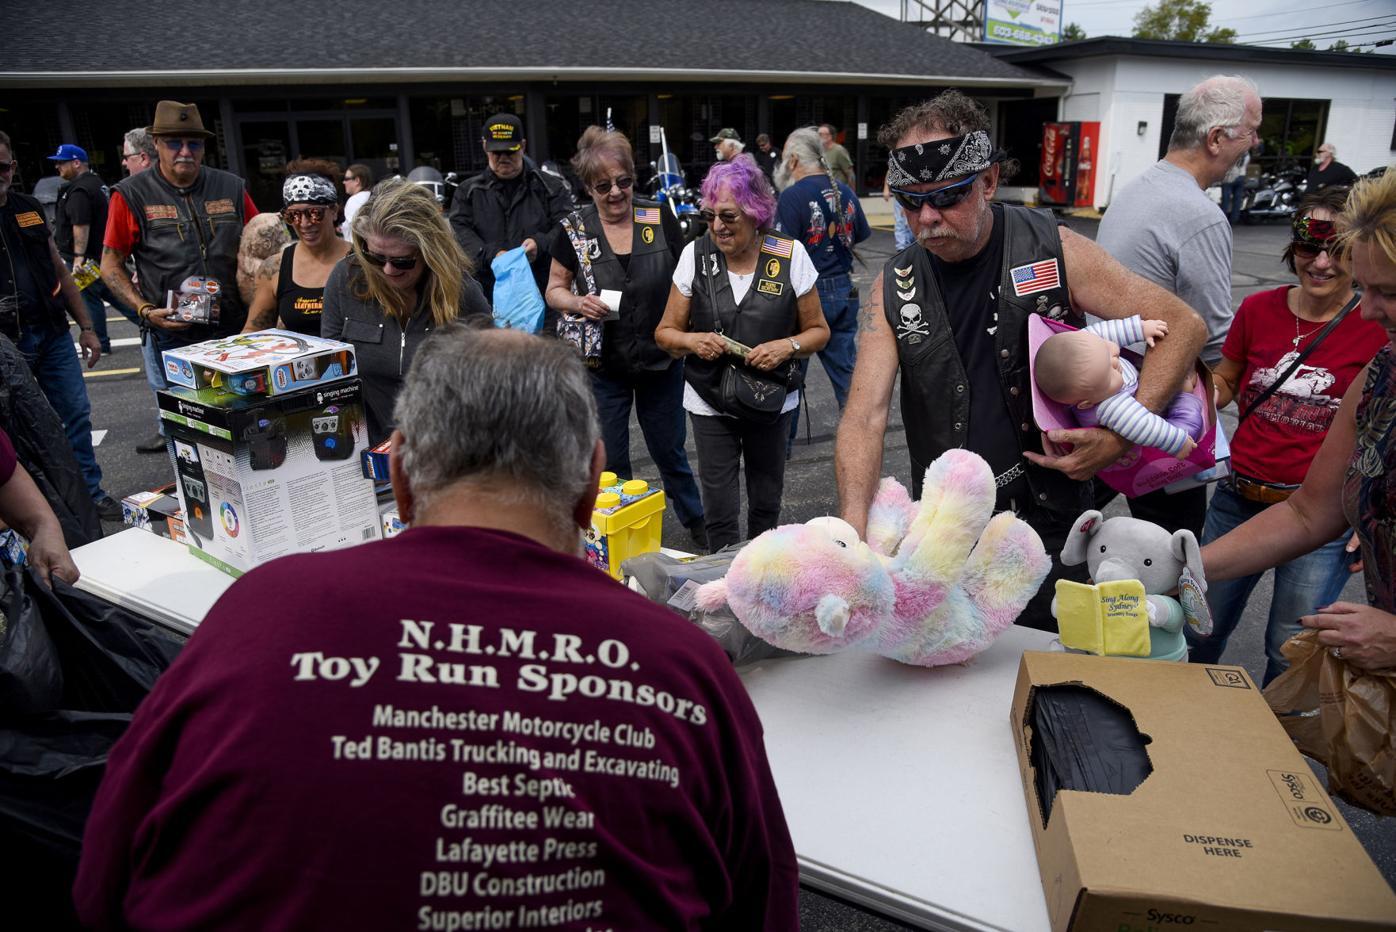 NHMRO Joanne Packard Memorial Toy Run donation